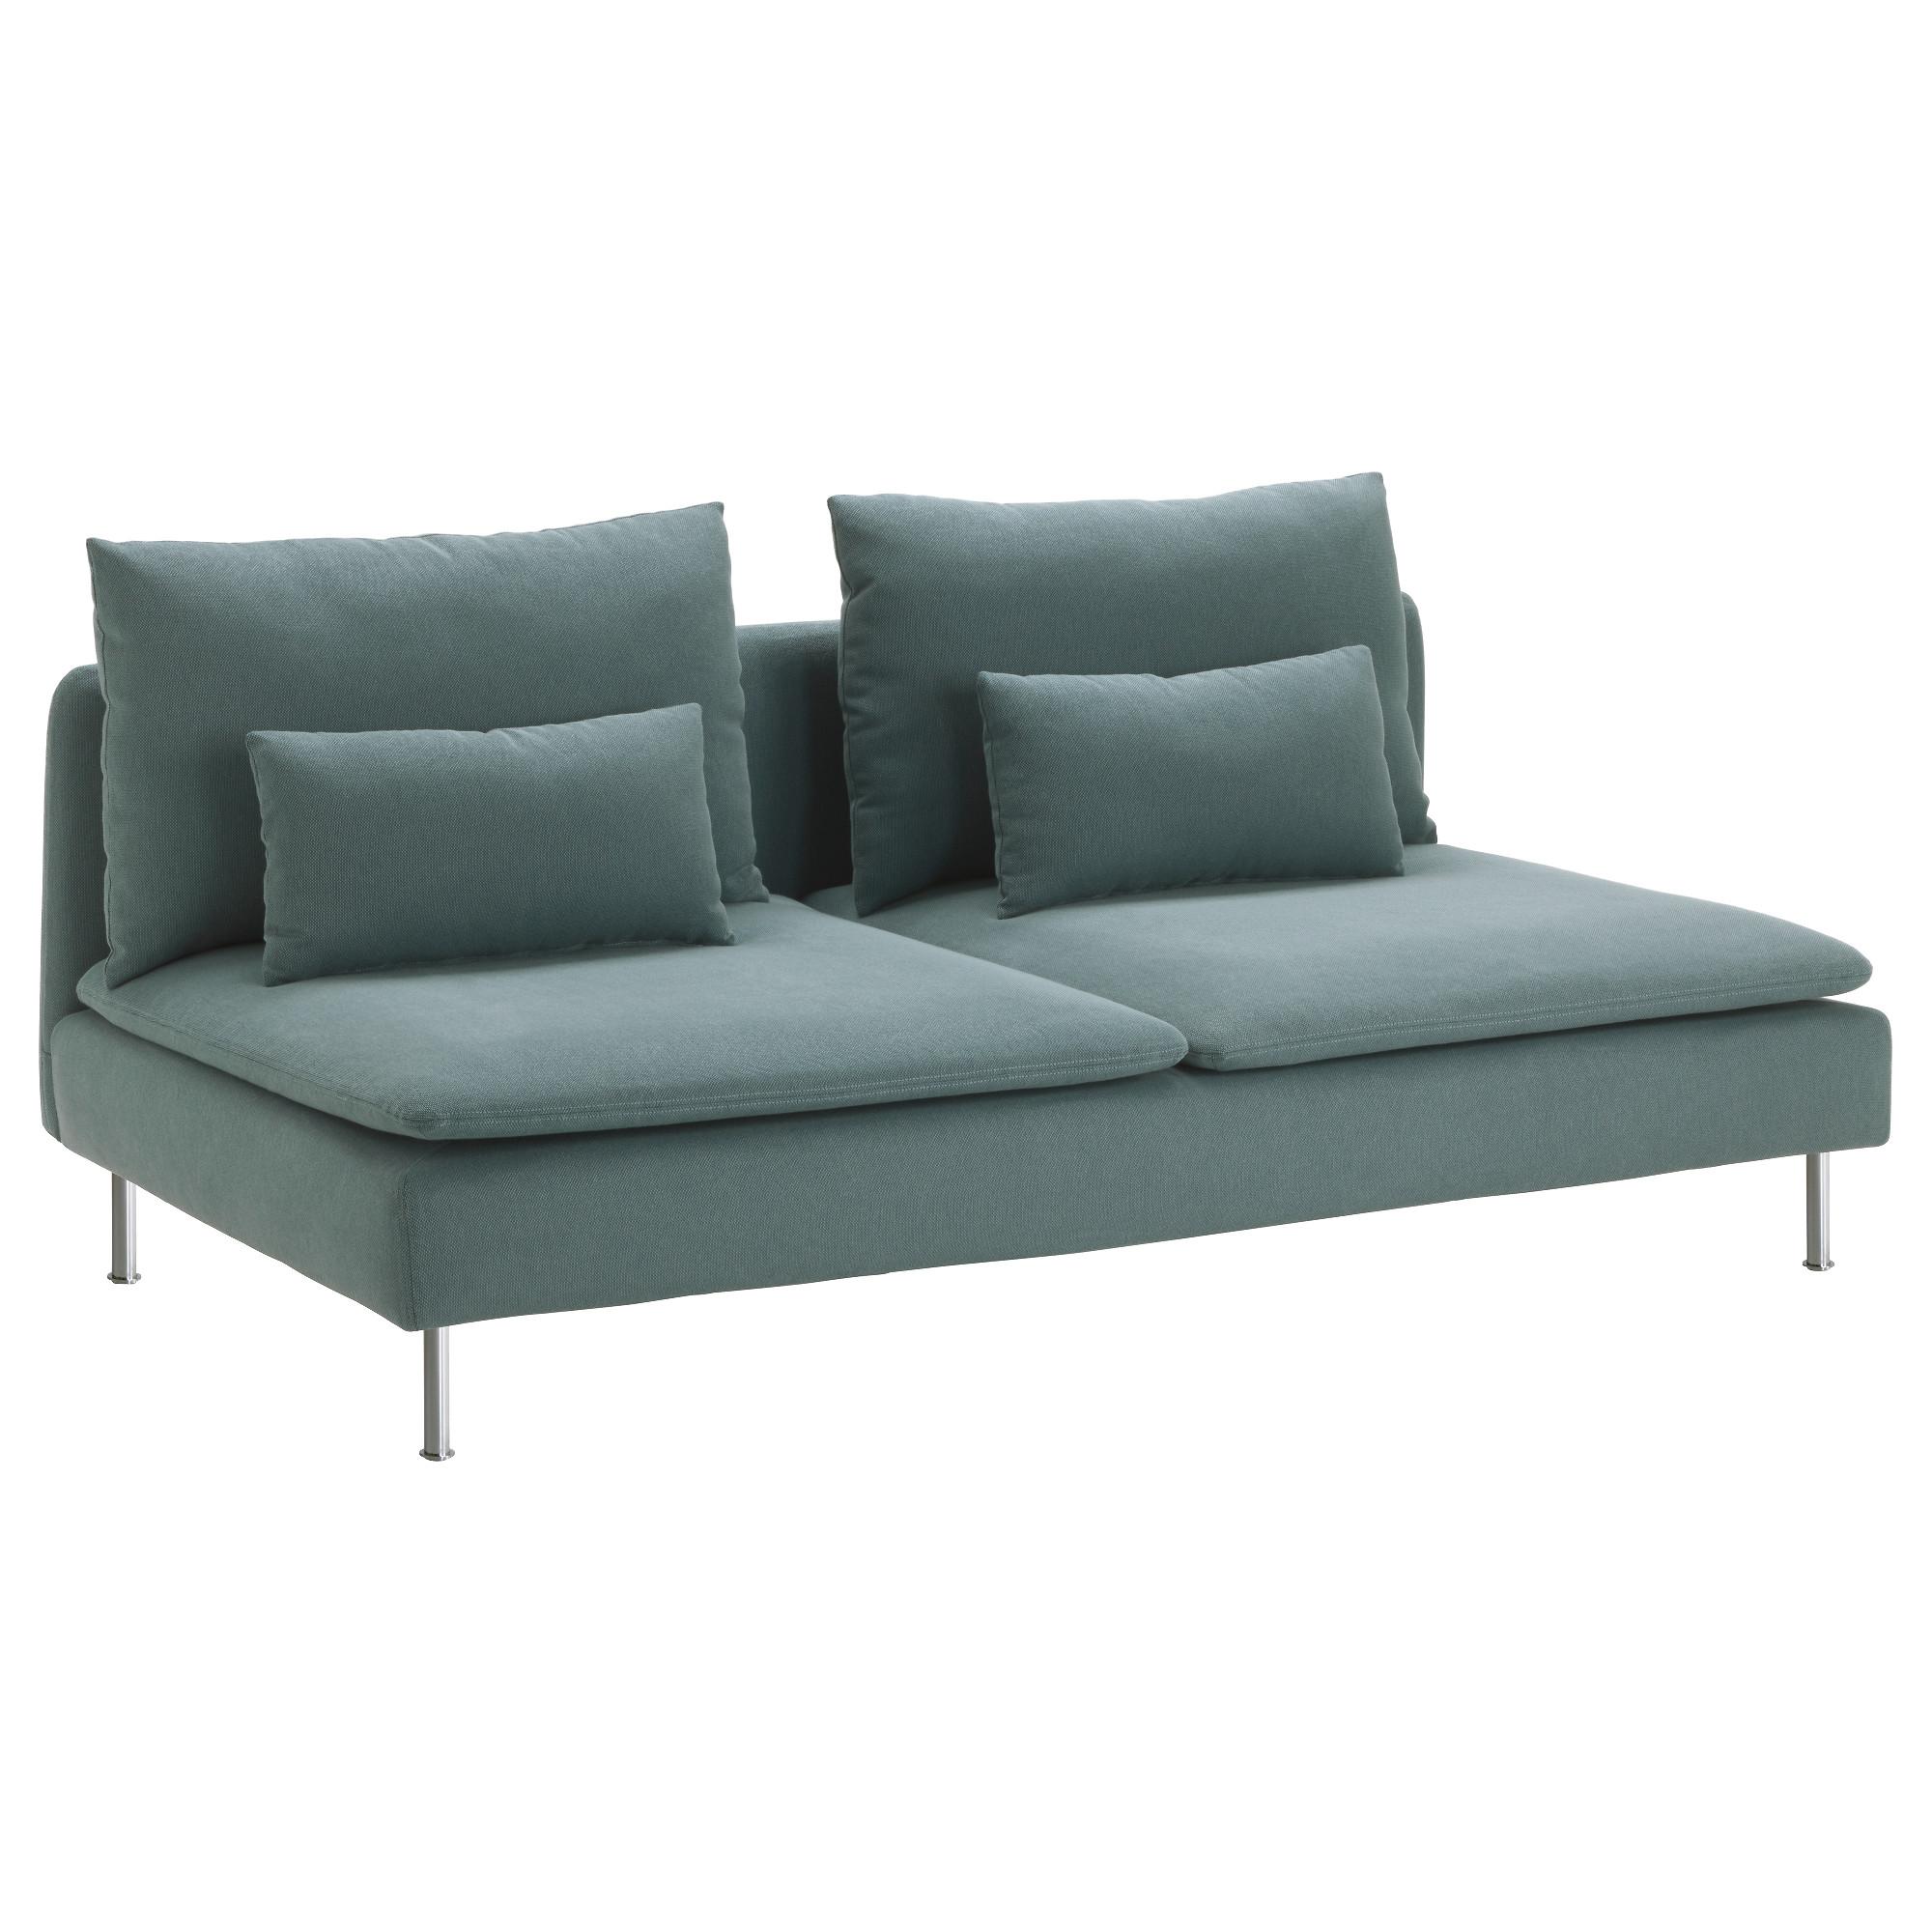 Ikea sofas Modulares Zwdg SÃ Derhamn MÃ Dulo 3 Finnsta Turquesa Ikea